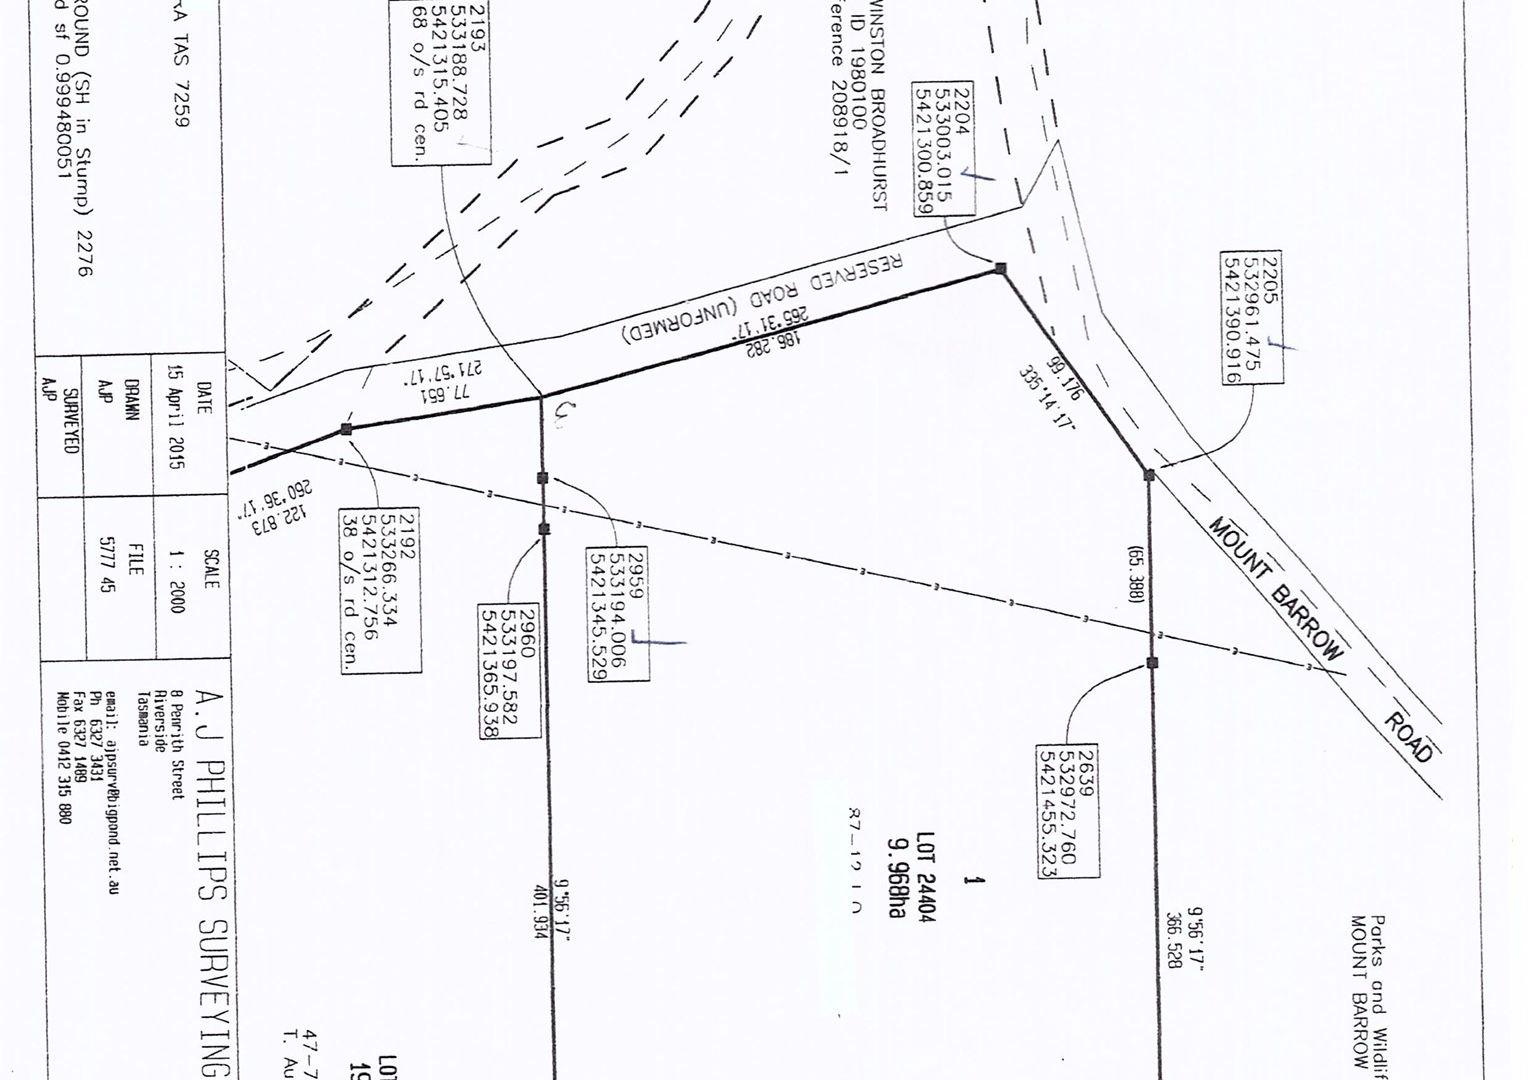 Lot 1/600 Mount Barrow Rd, Nunamara TAS 7259, Image 2